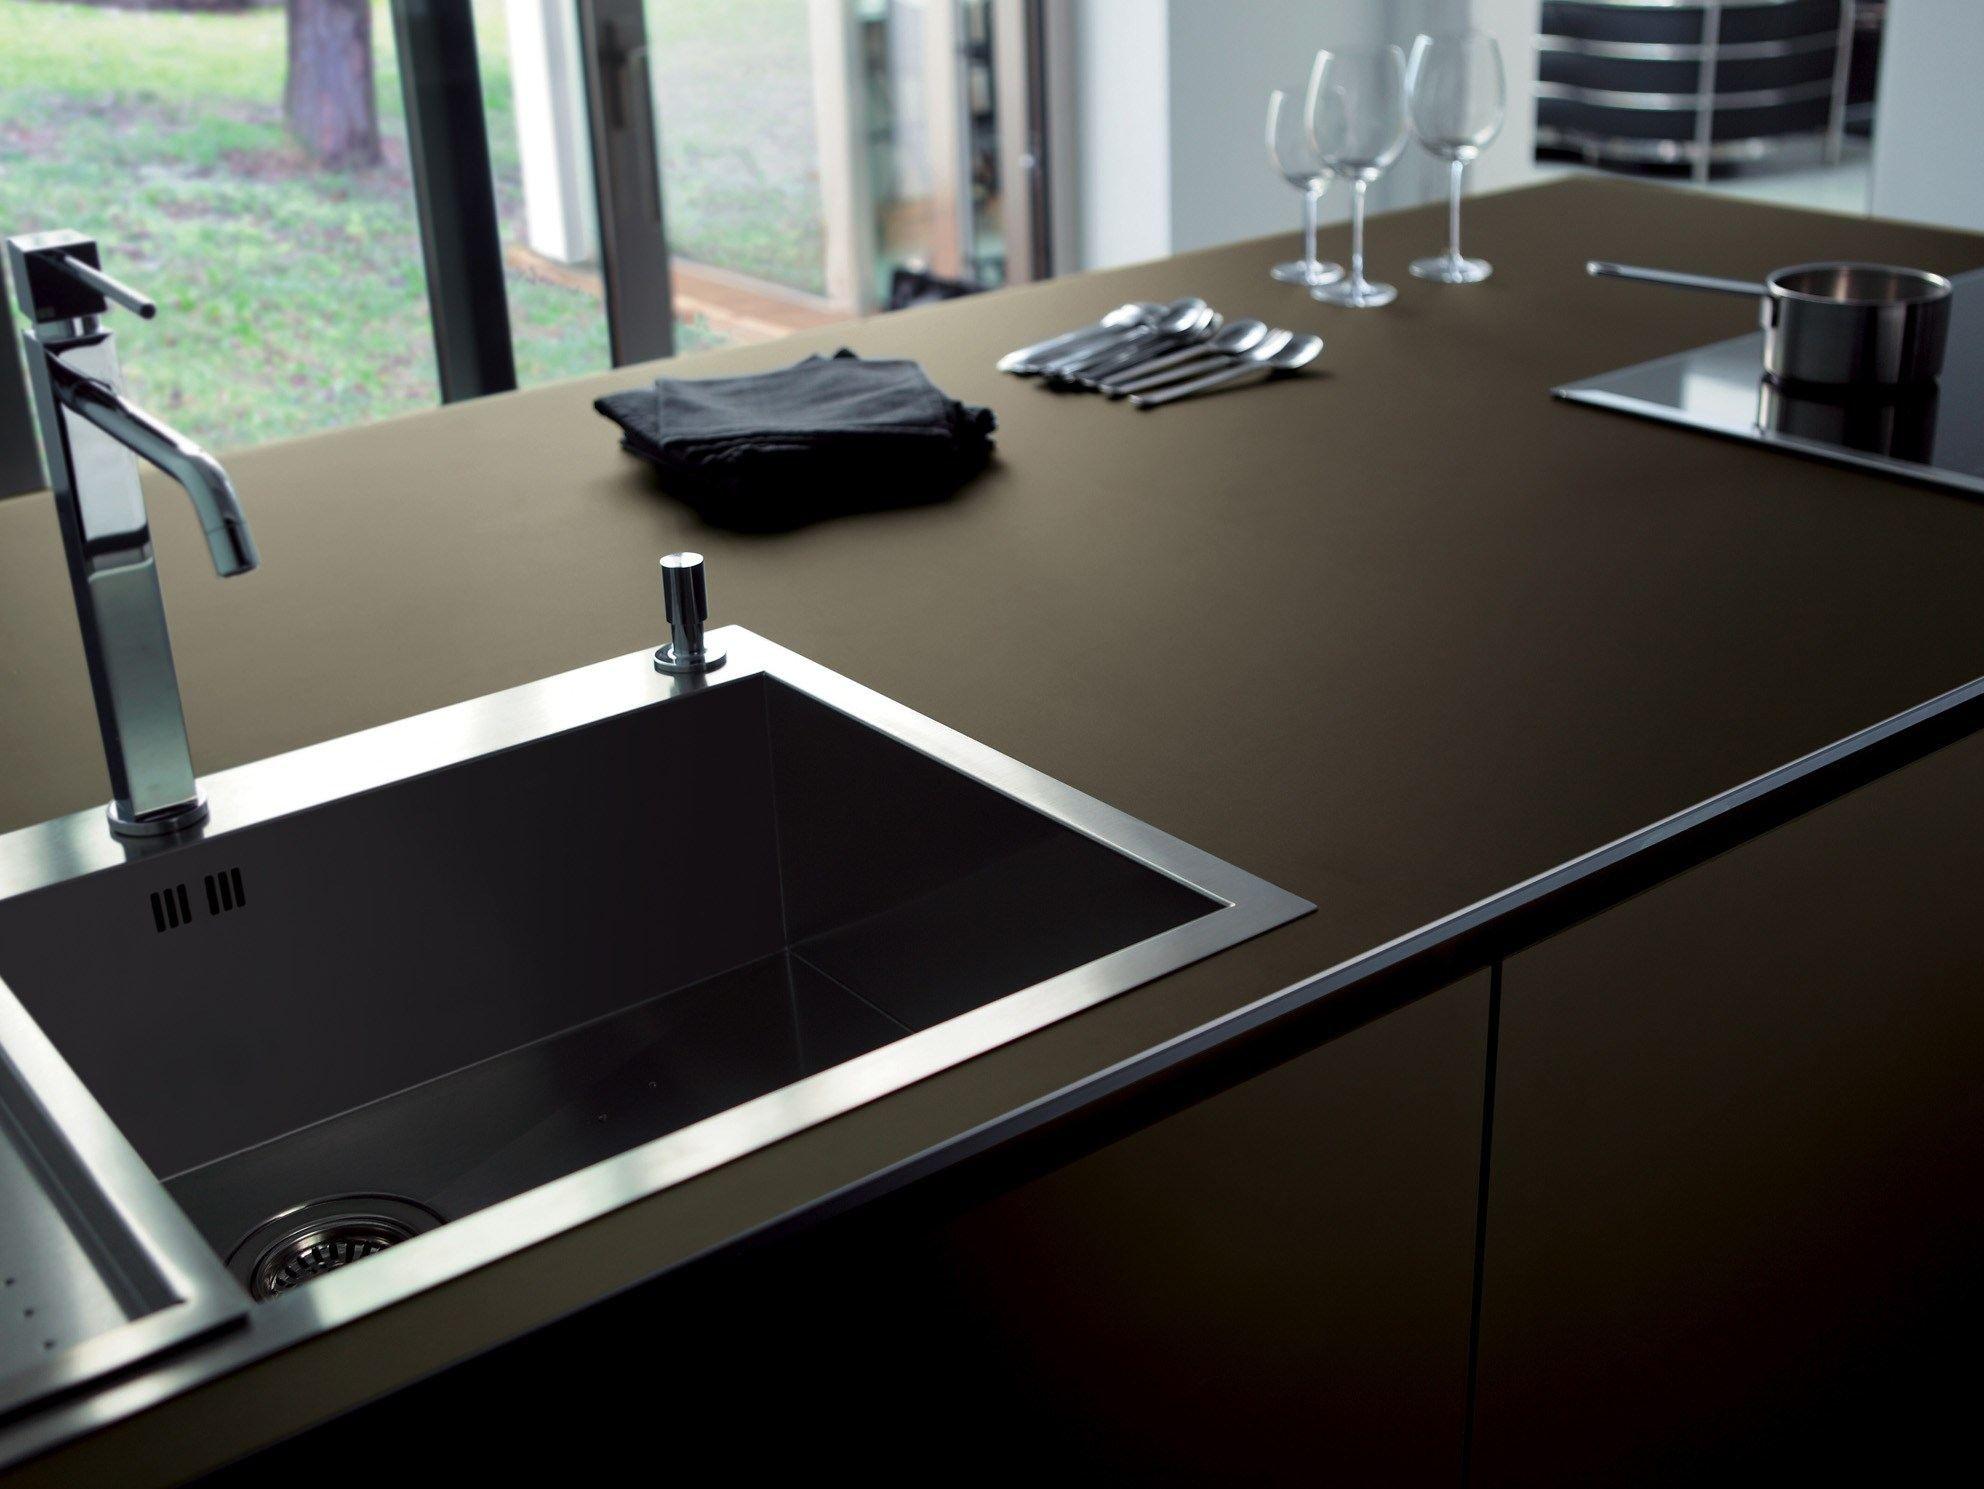 Decoropal by omnidecor - Top cucina in vetro ...